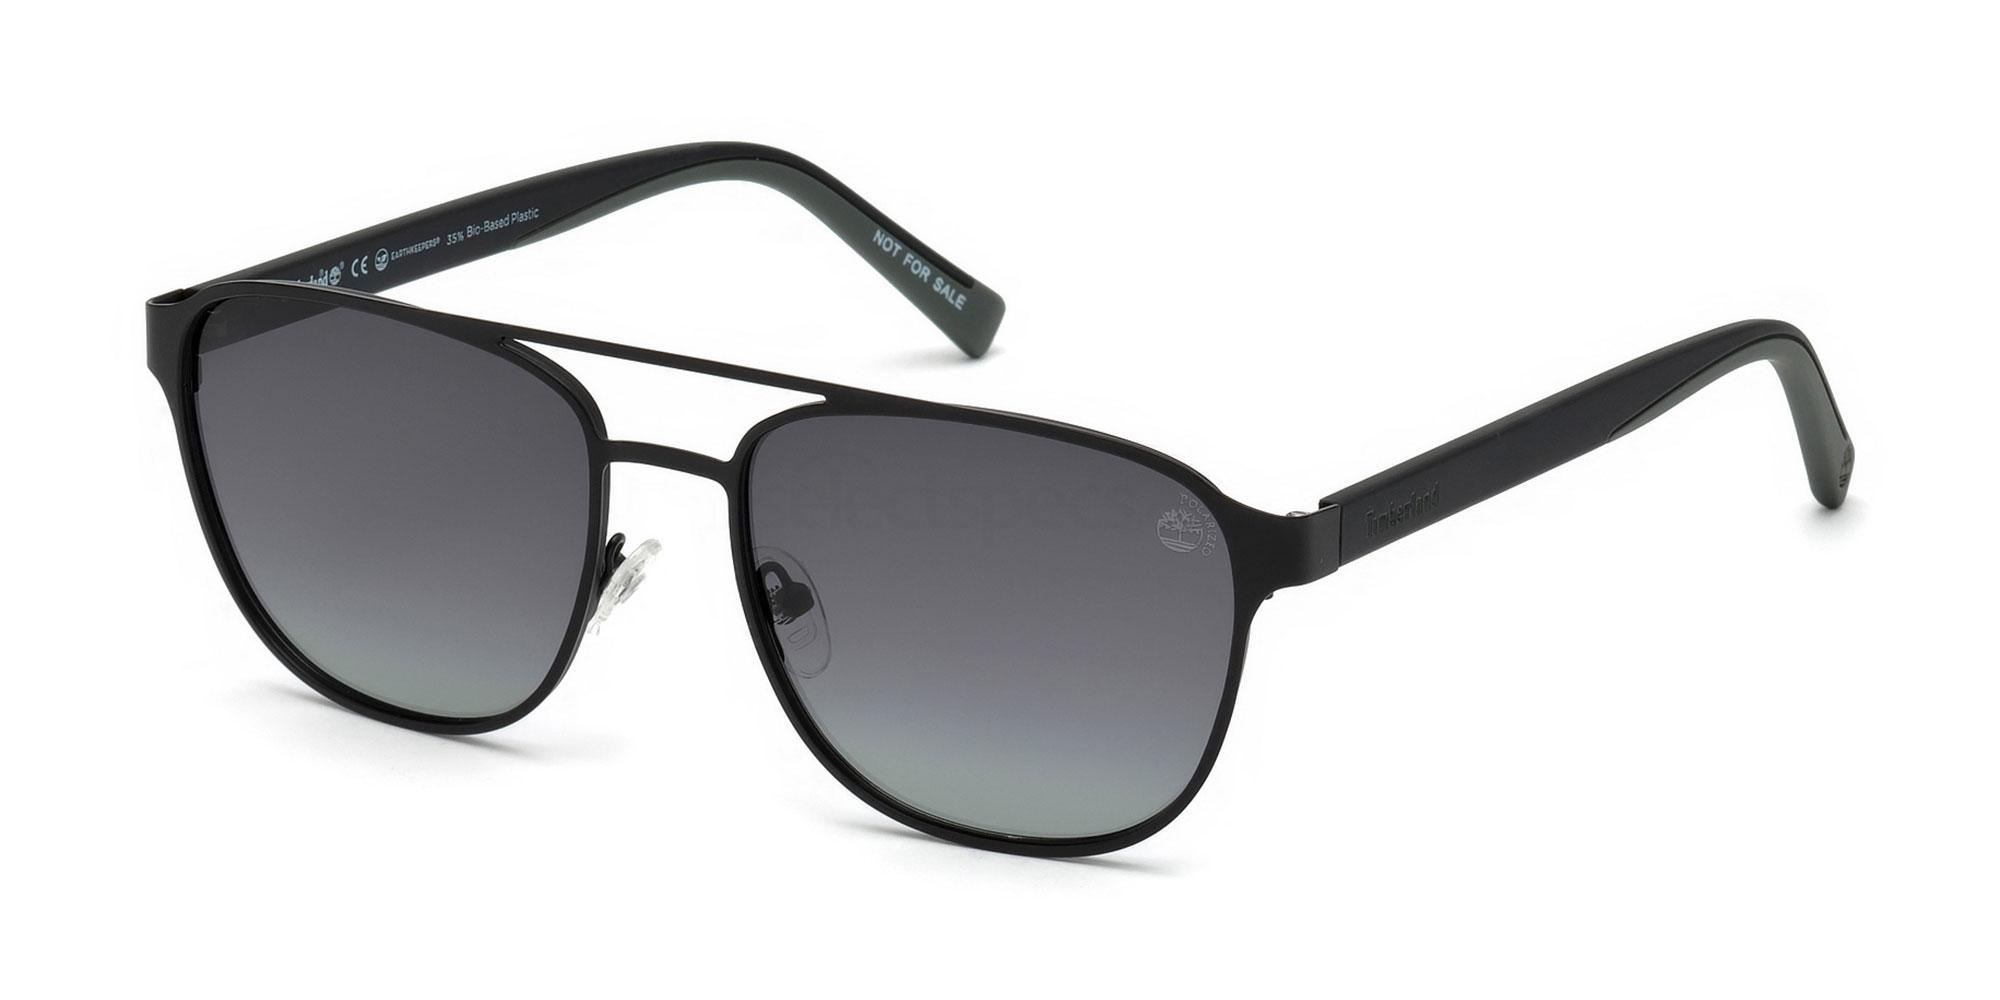 02D TB9146 Sunglasses, Timberland